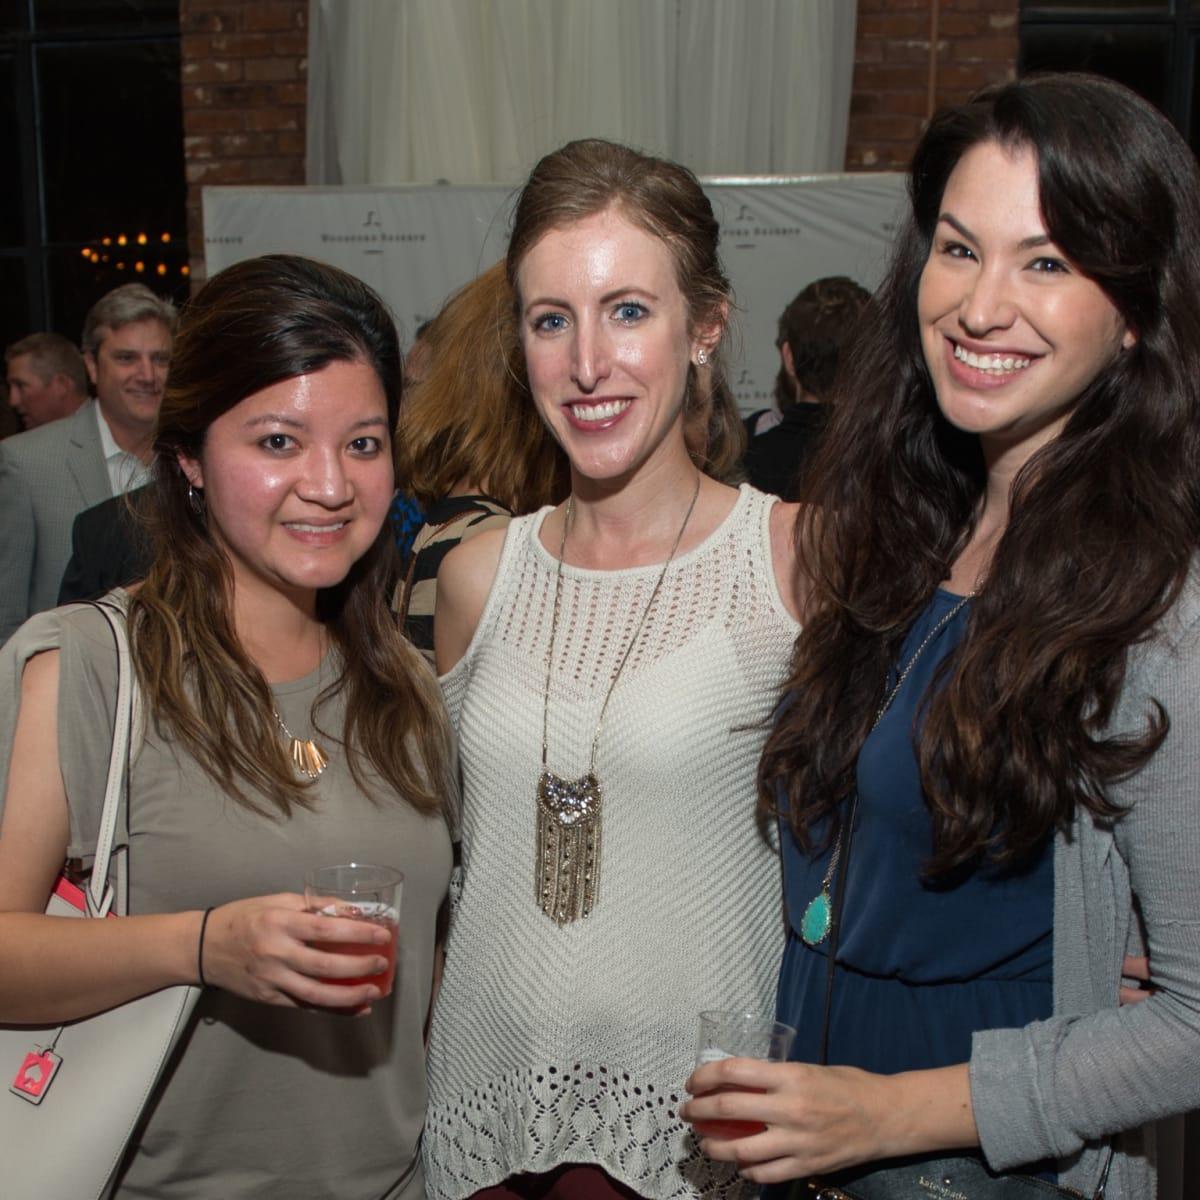 Holiday Spirit Social 2017 Jackie Le, Kristie Fischer, Rachel Burk